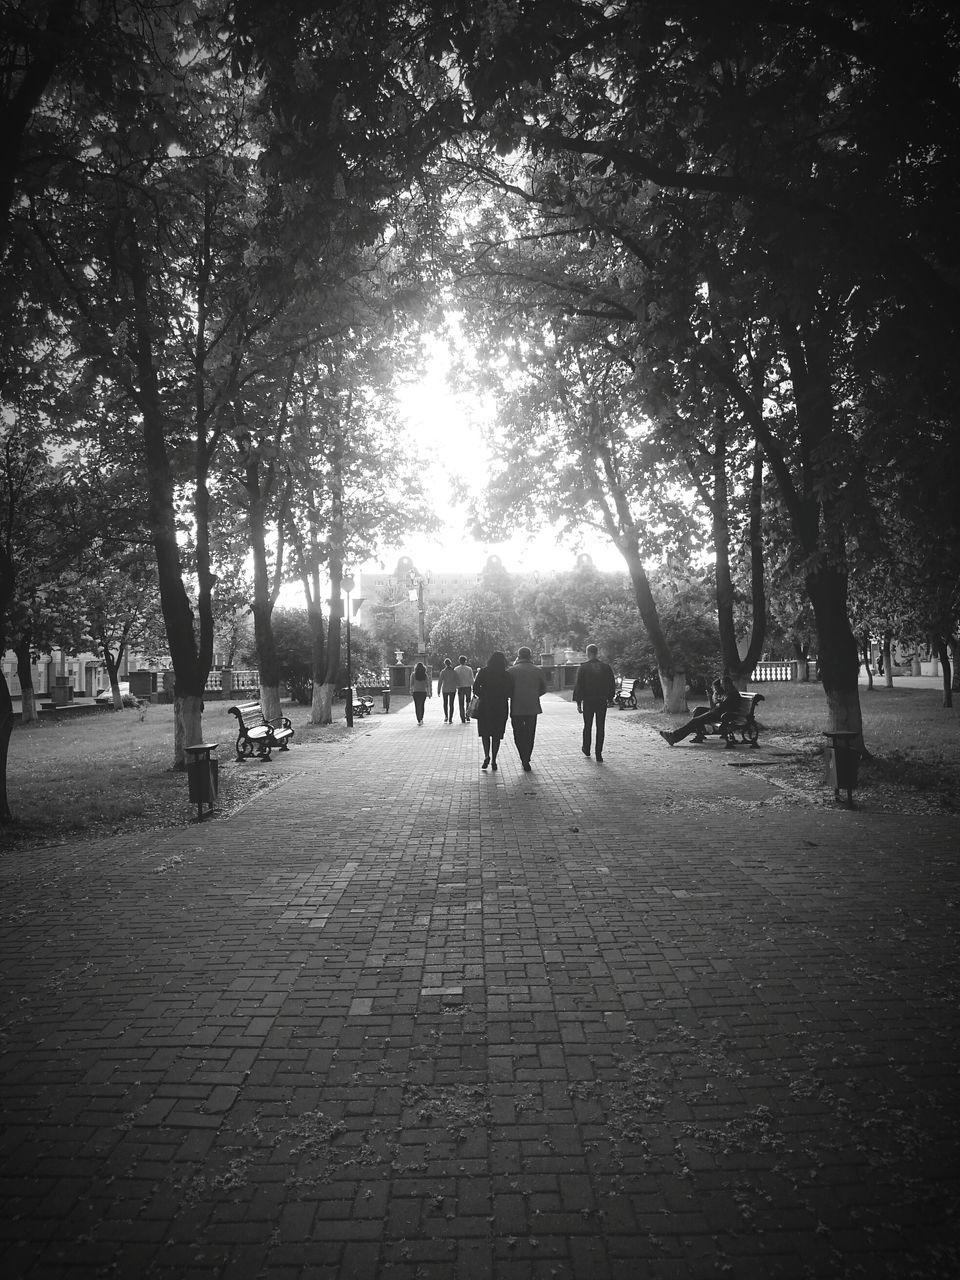 People Amidst Trees Against Sky